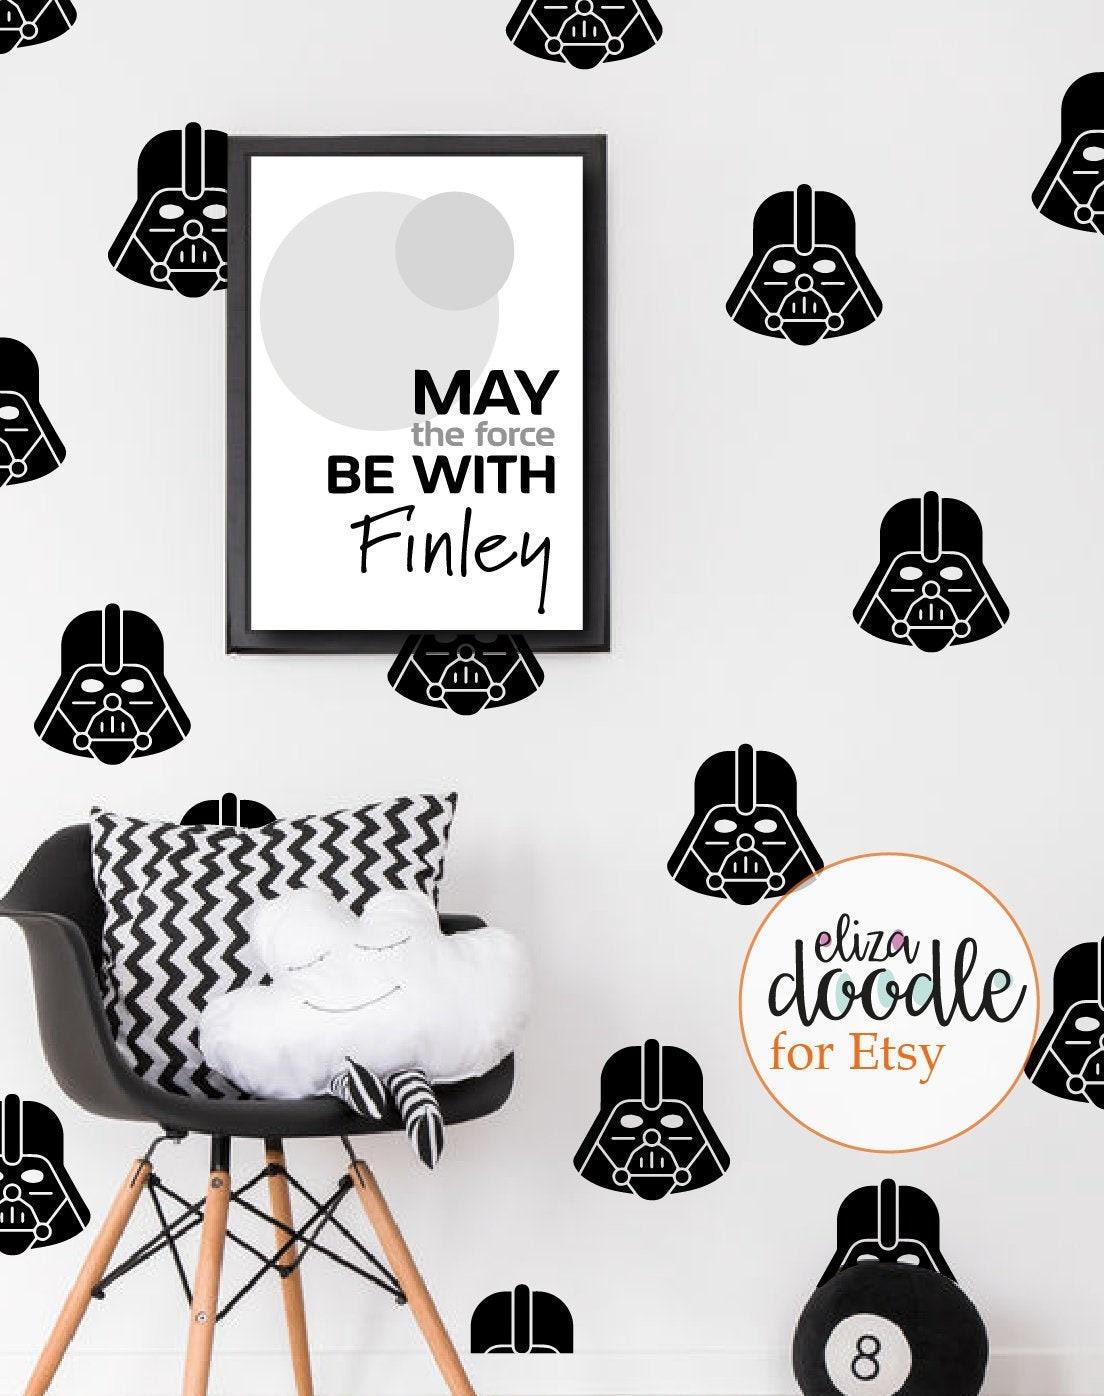 Darth Vader Wall Decals Darth Vader Masks Star Wars Wall Etsy